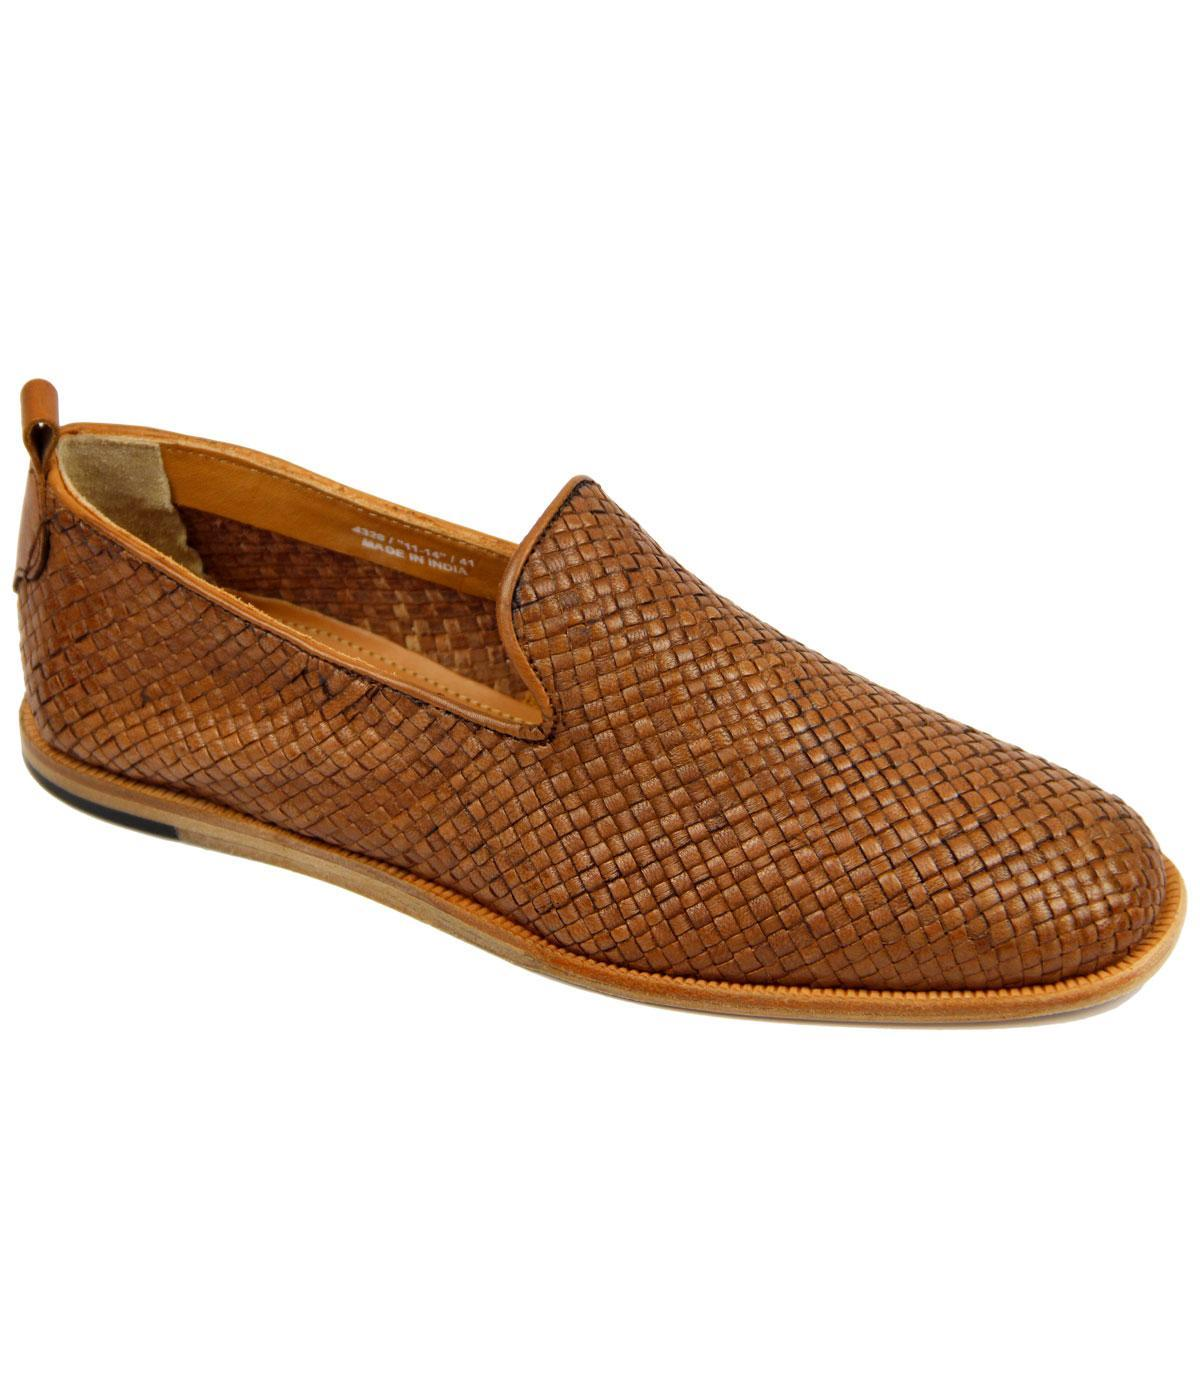 Ipanema HUDSON Retro Basket Weave Slip-On Shoes